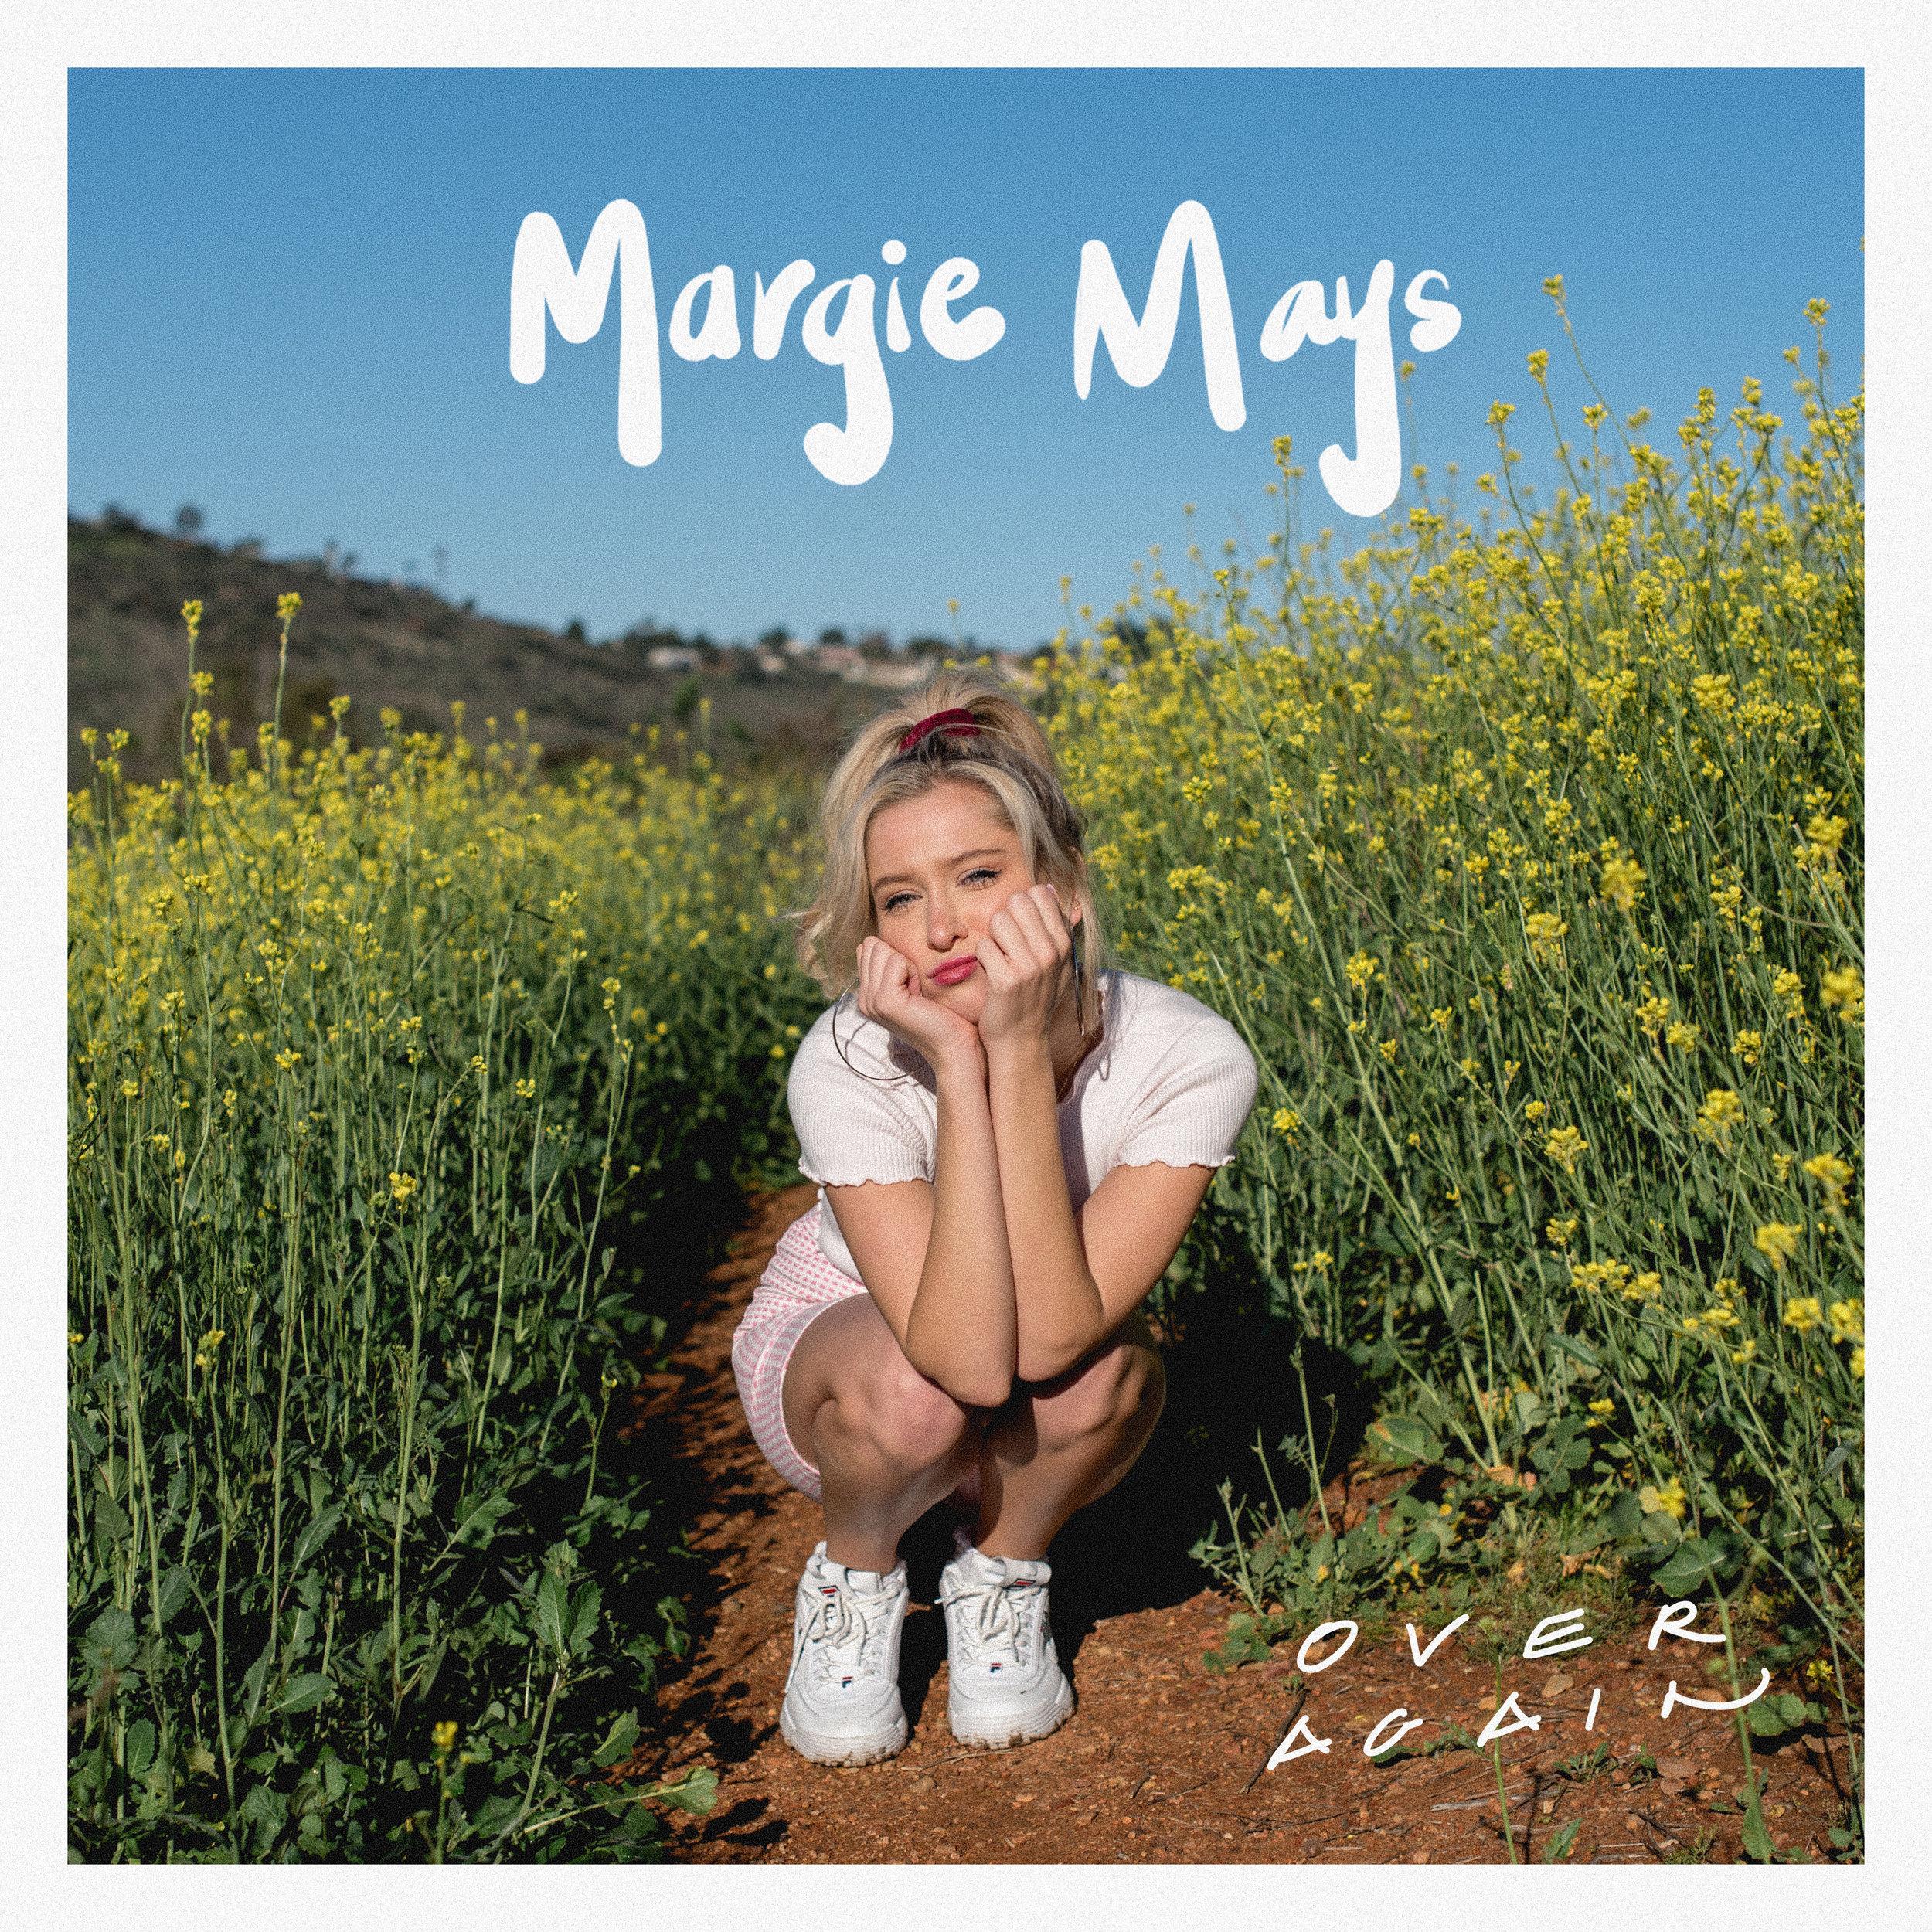 Margie-Mays-Over-Again Album Cover.jpg